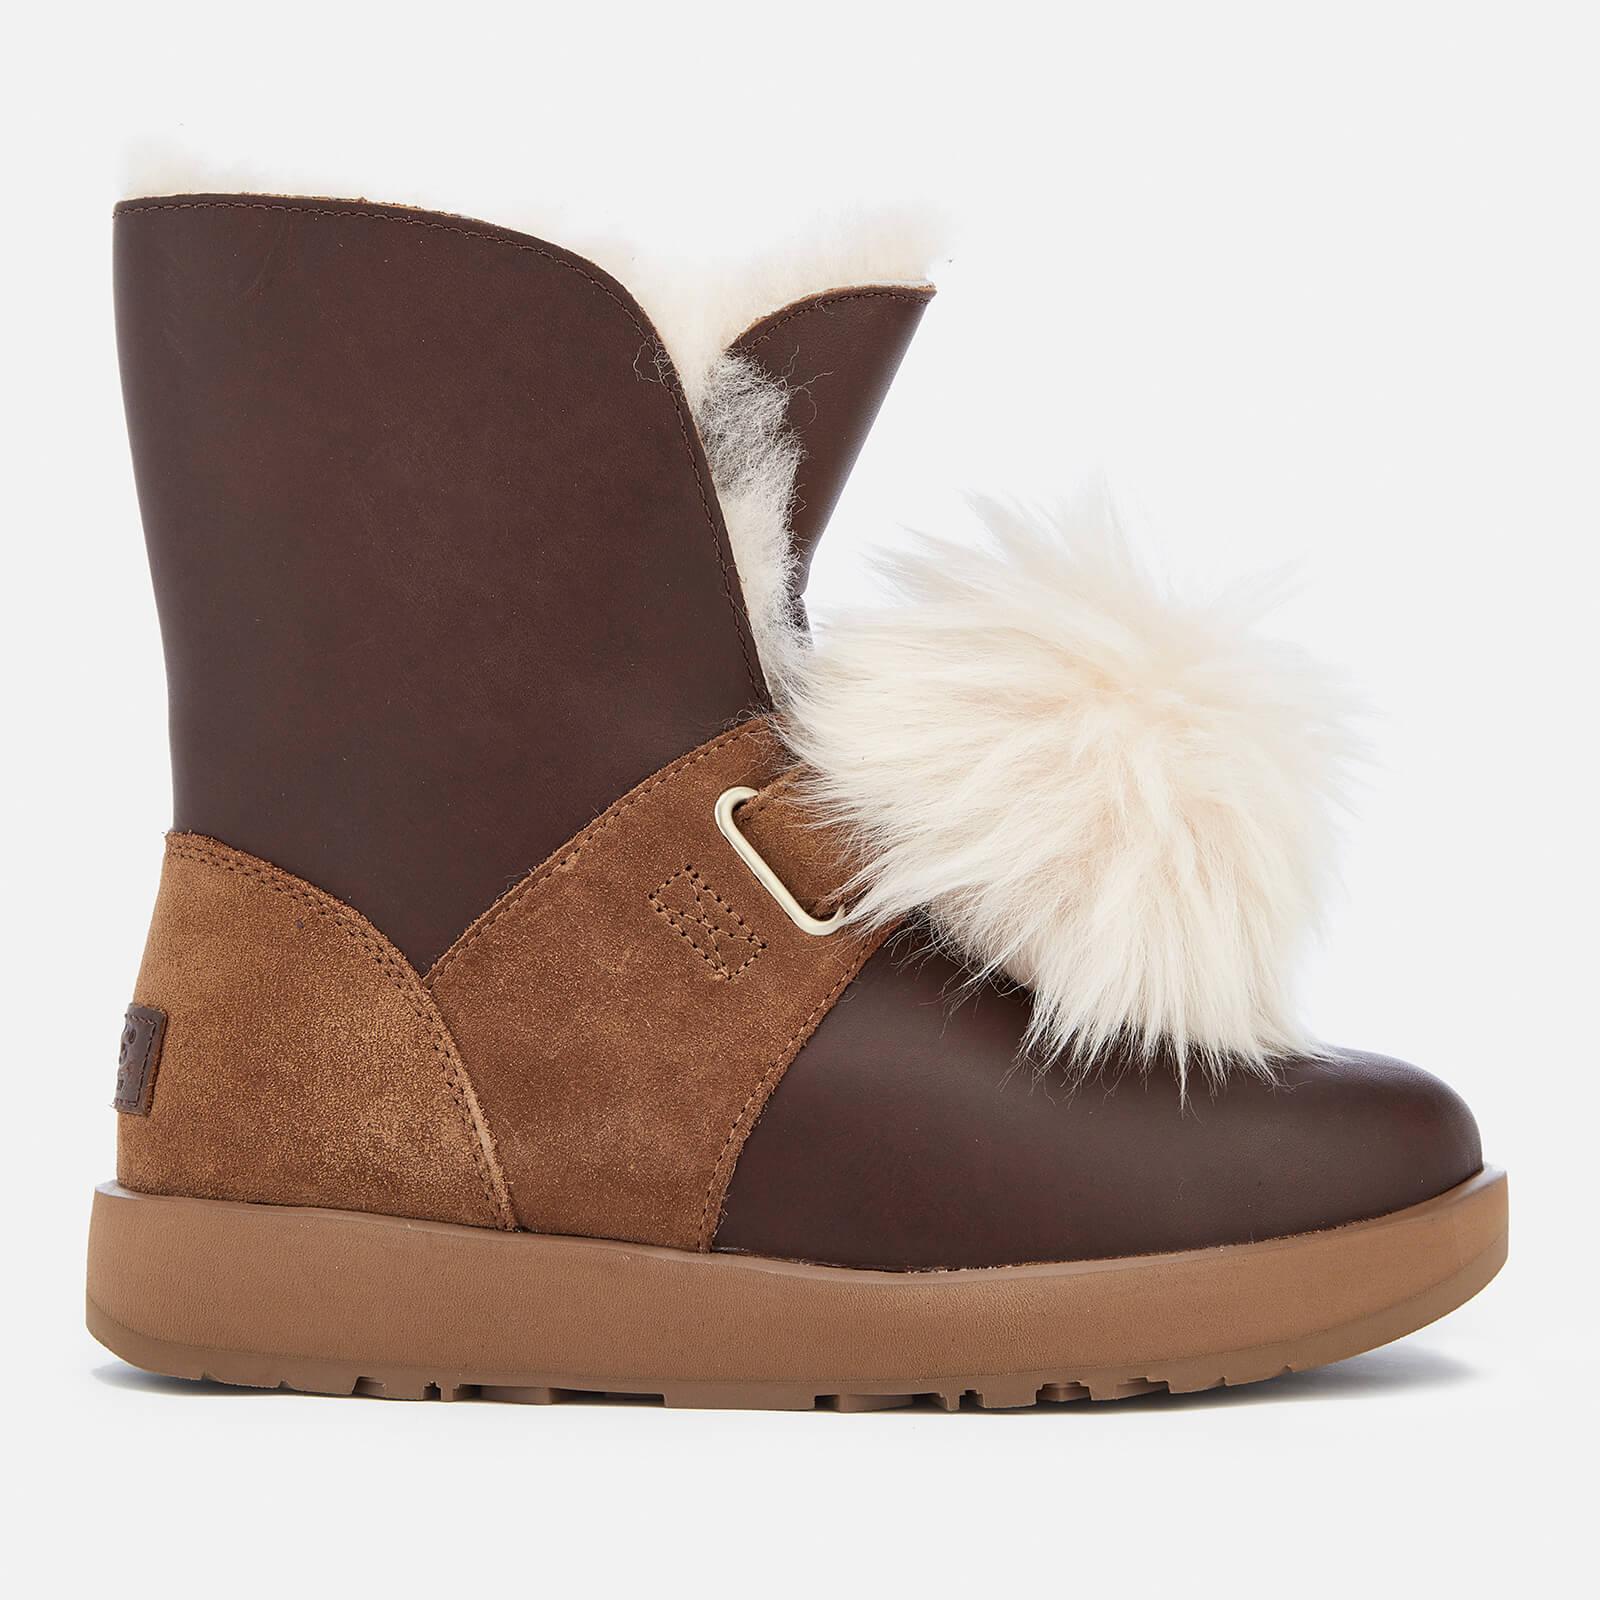 db943259a82 UGG Women's Isley Waterproof Pom Sheepskin Boots - Chestnut